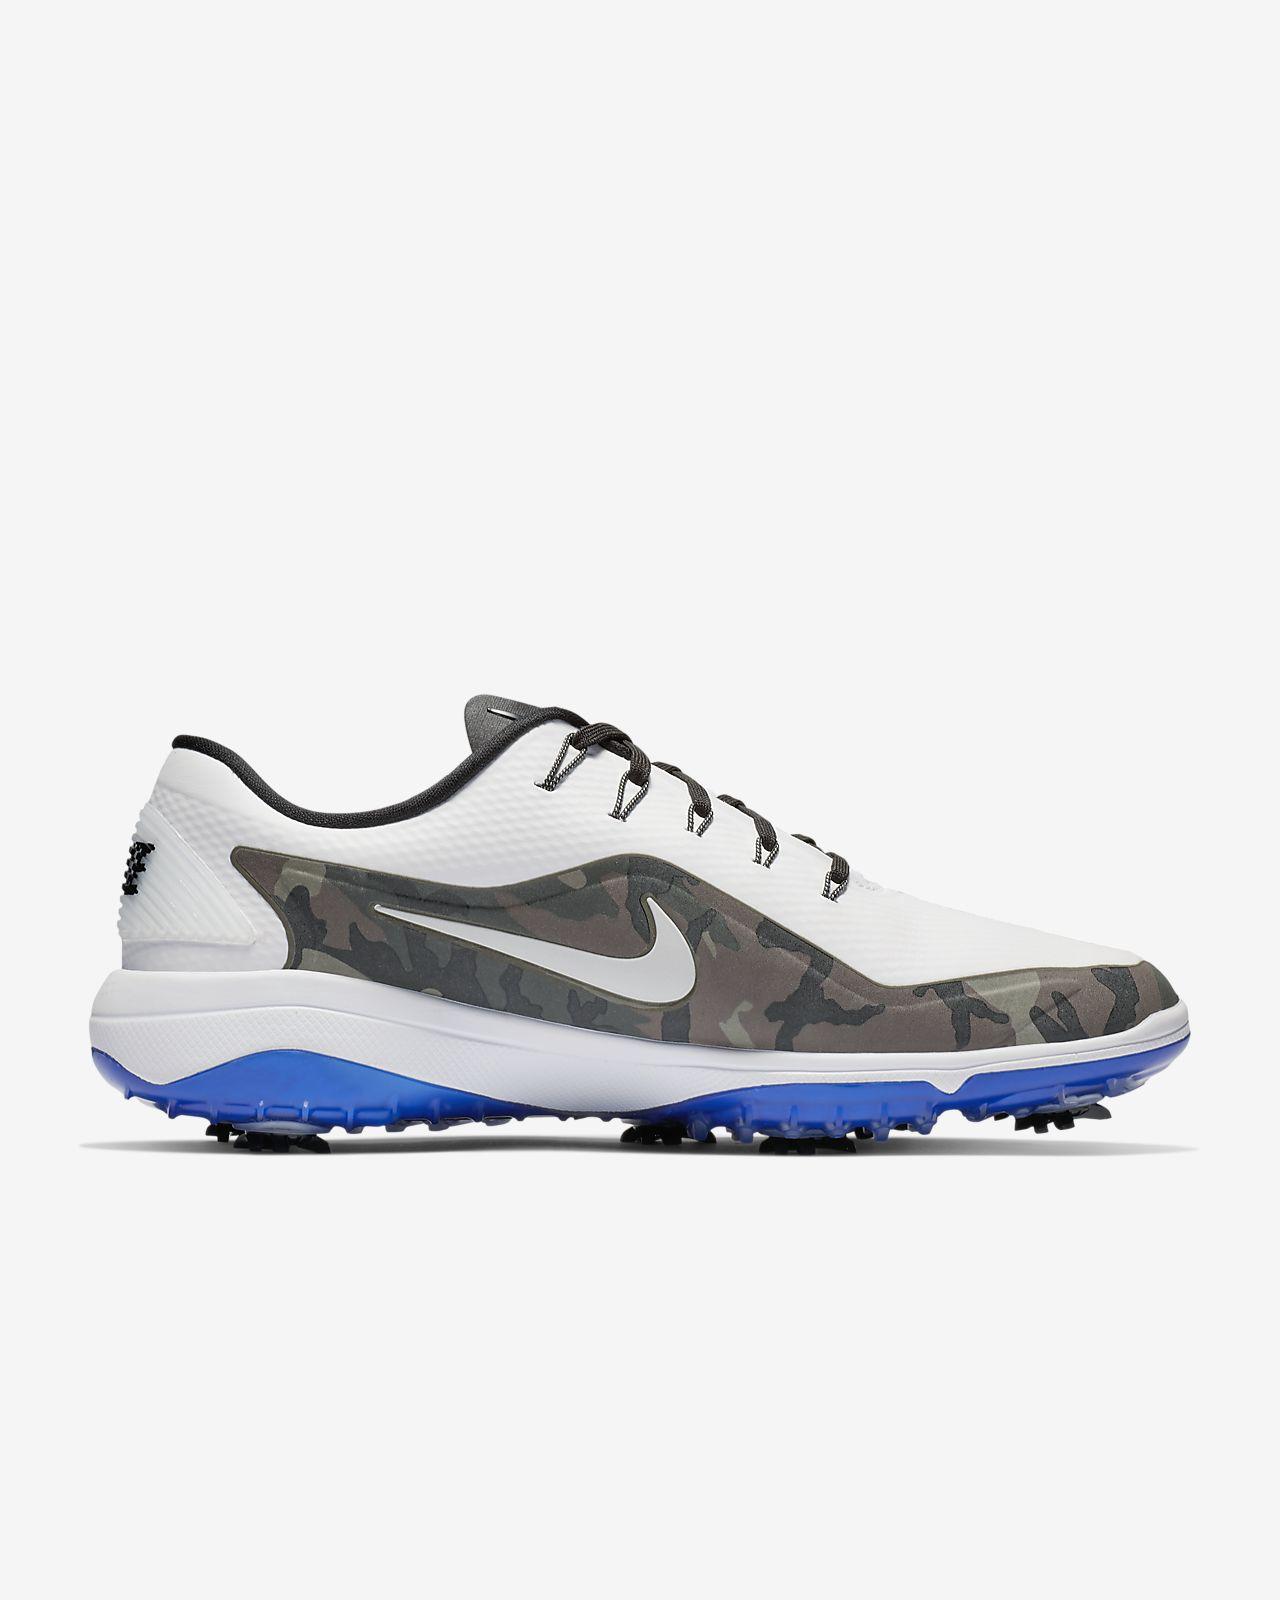 3a365b1251f4 Nike React Vapor 2 NRG Men s Golf Shoe. Nike.com GB